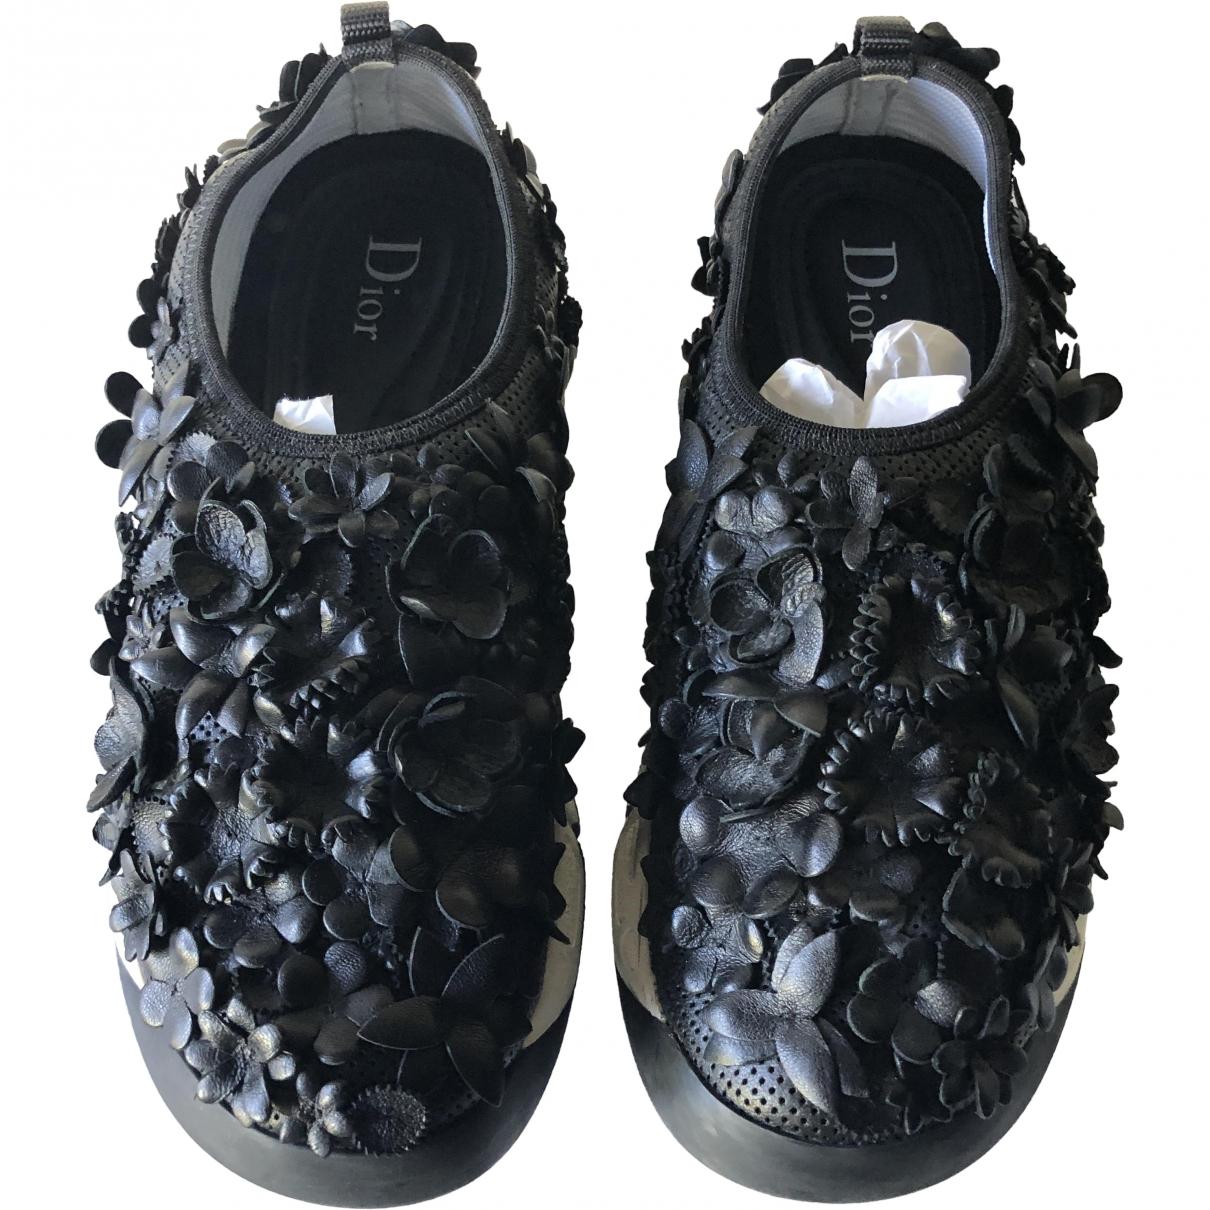 Dior Dior Fusion Black Fur Trainers for Women 36.5 EU